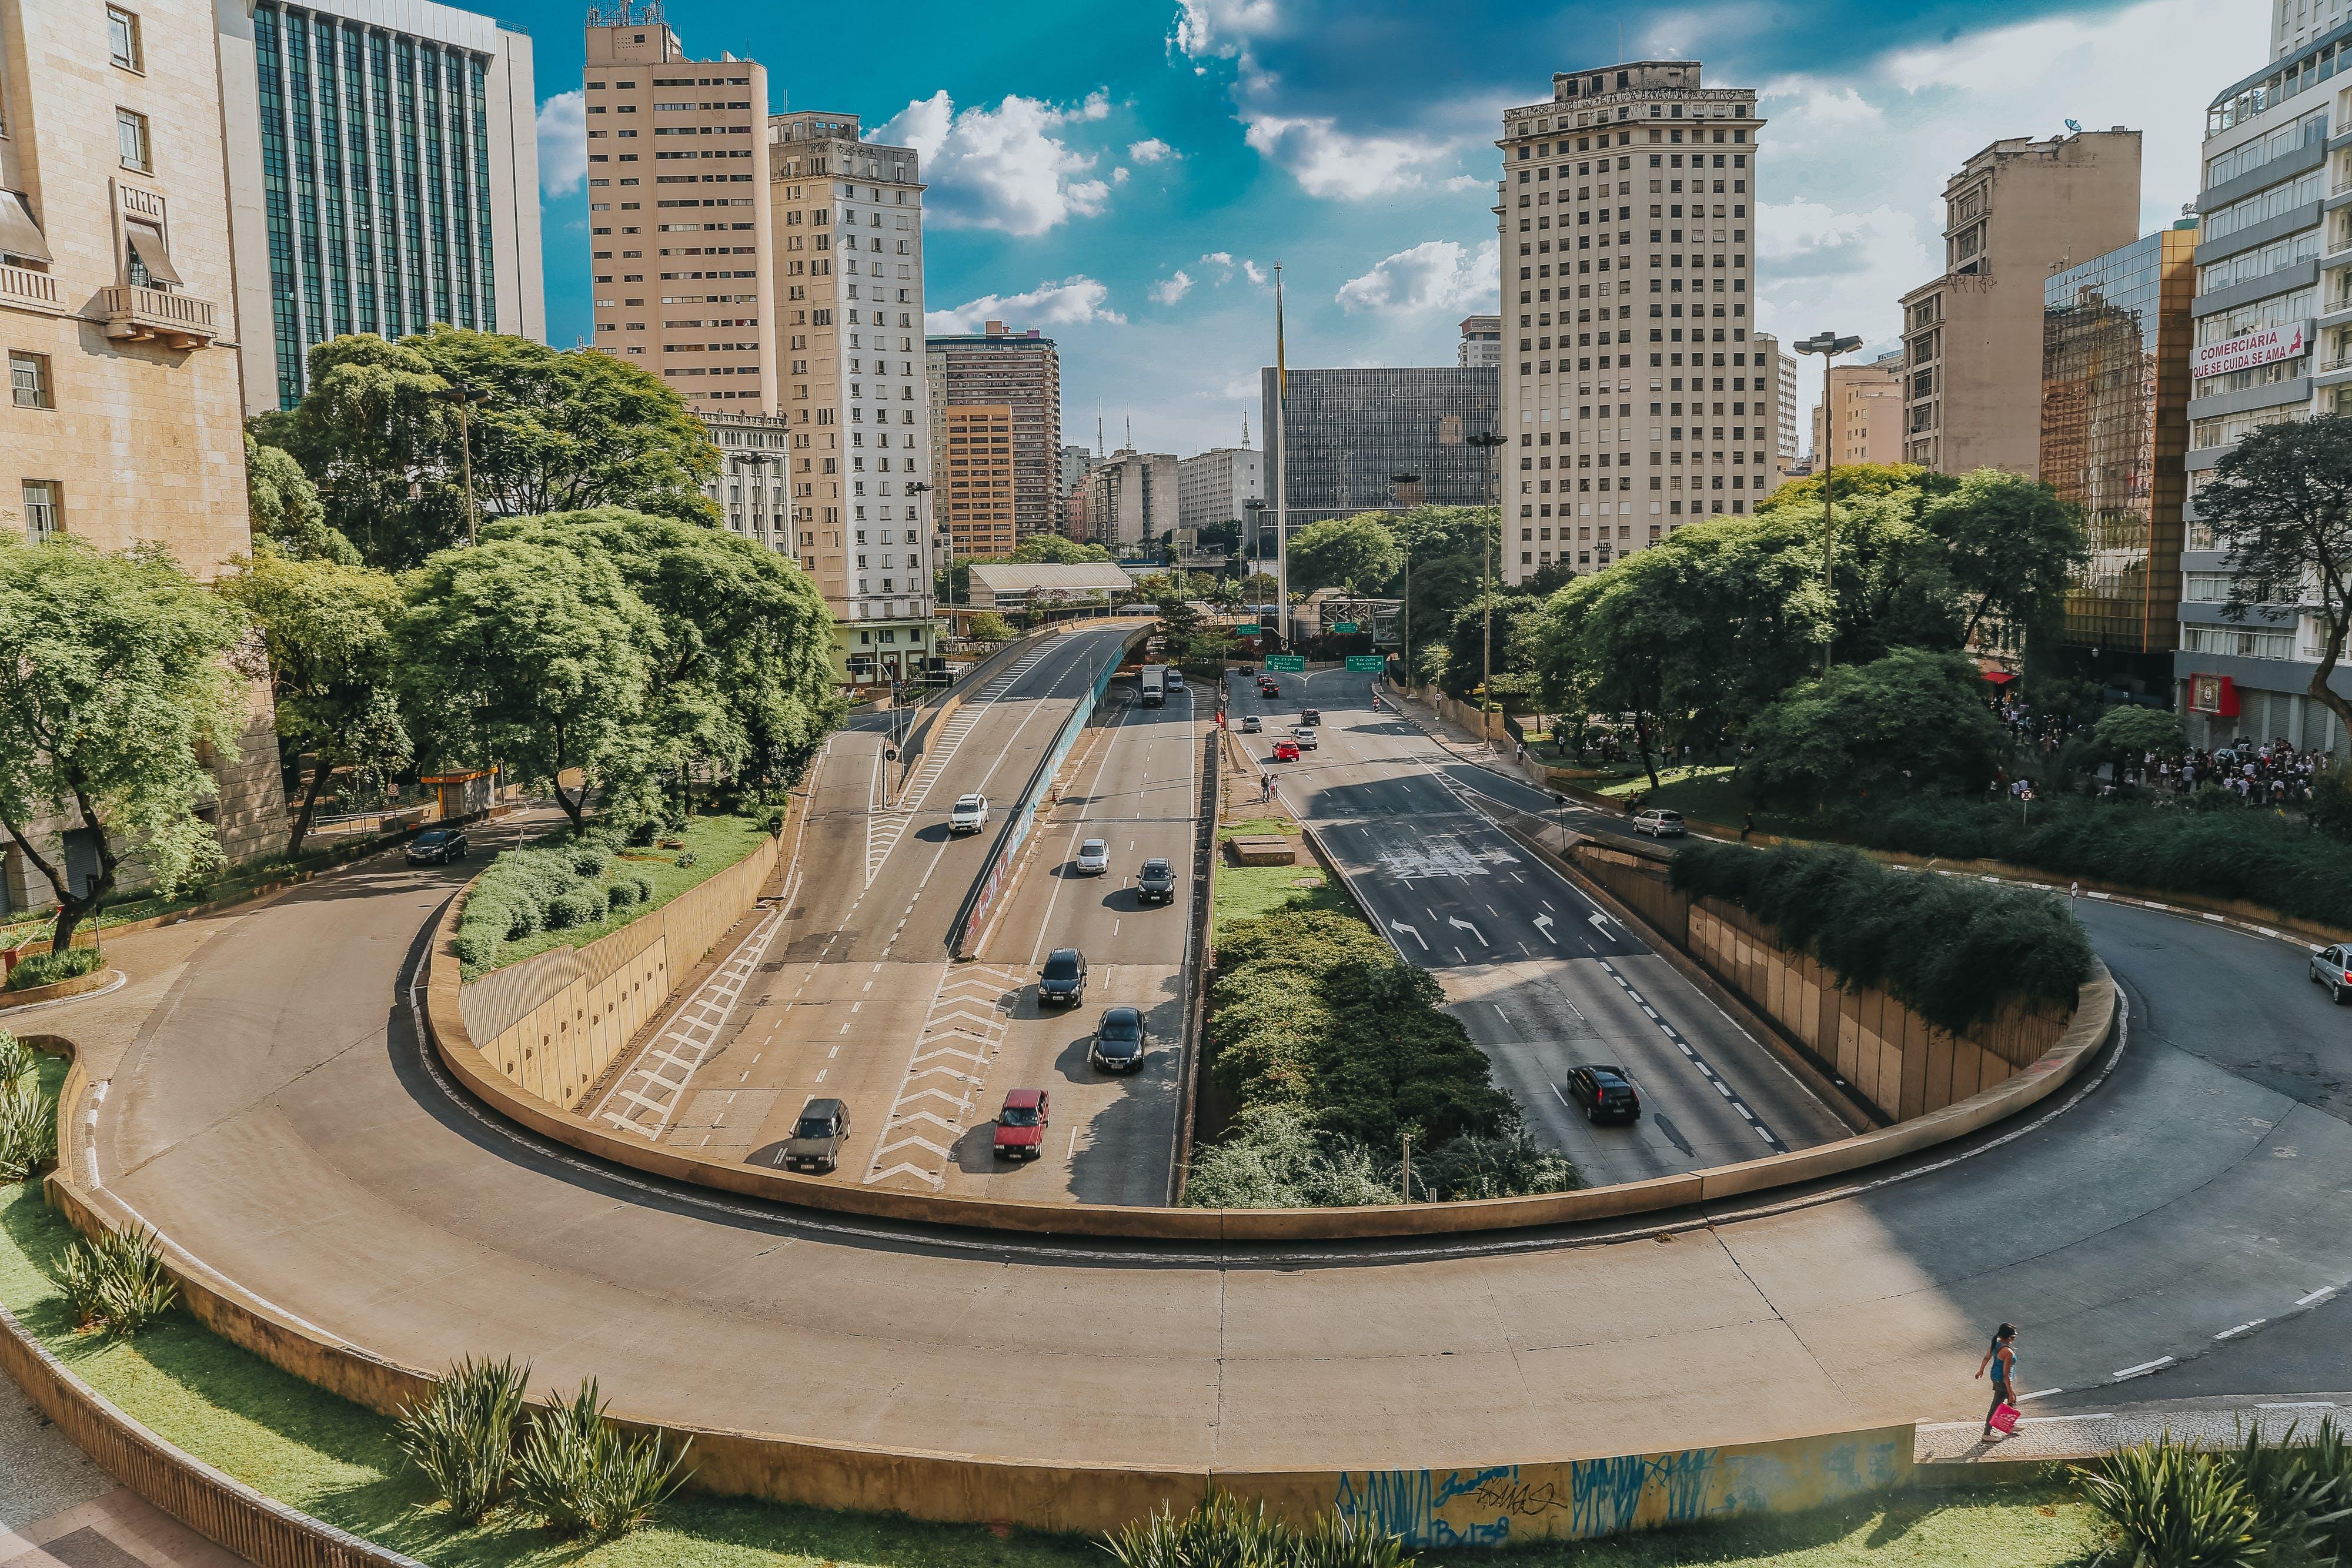 Gratis stockfoto met architectuur, auto's, binnenstad, bomen